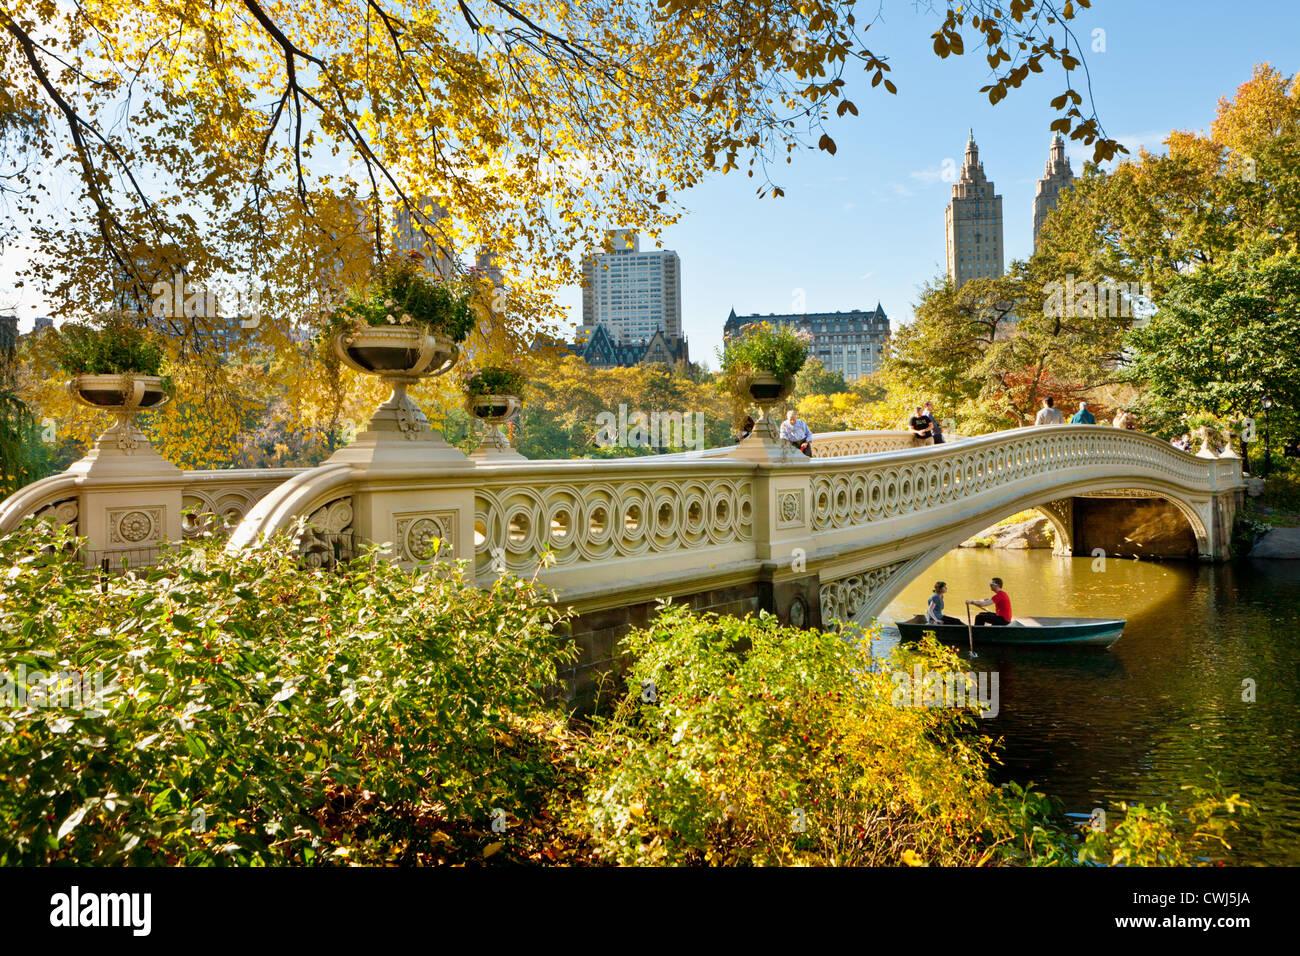 Panoramic Wallpaper Fall The Cast Iron Bow Bridge By Calvert Vaux Central Park